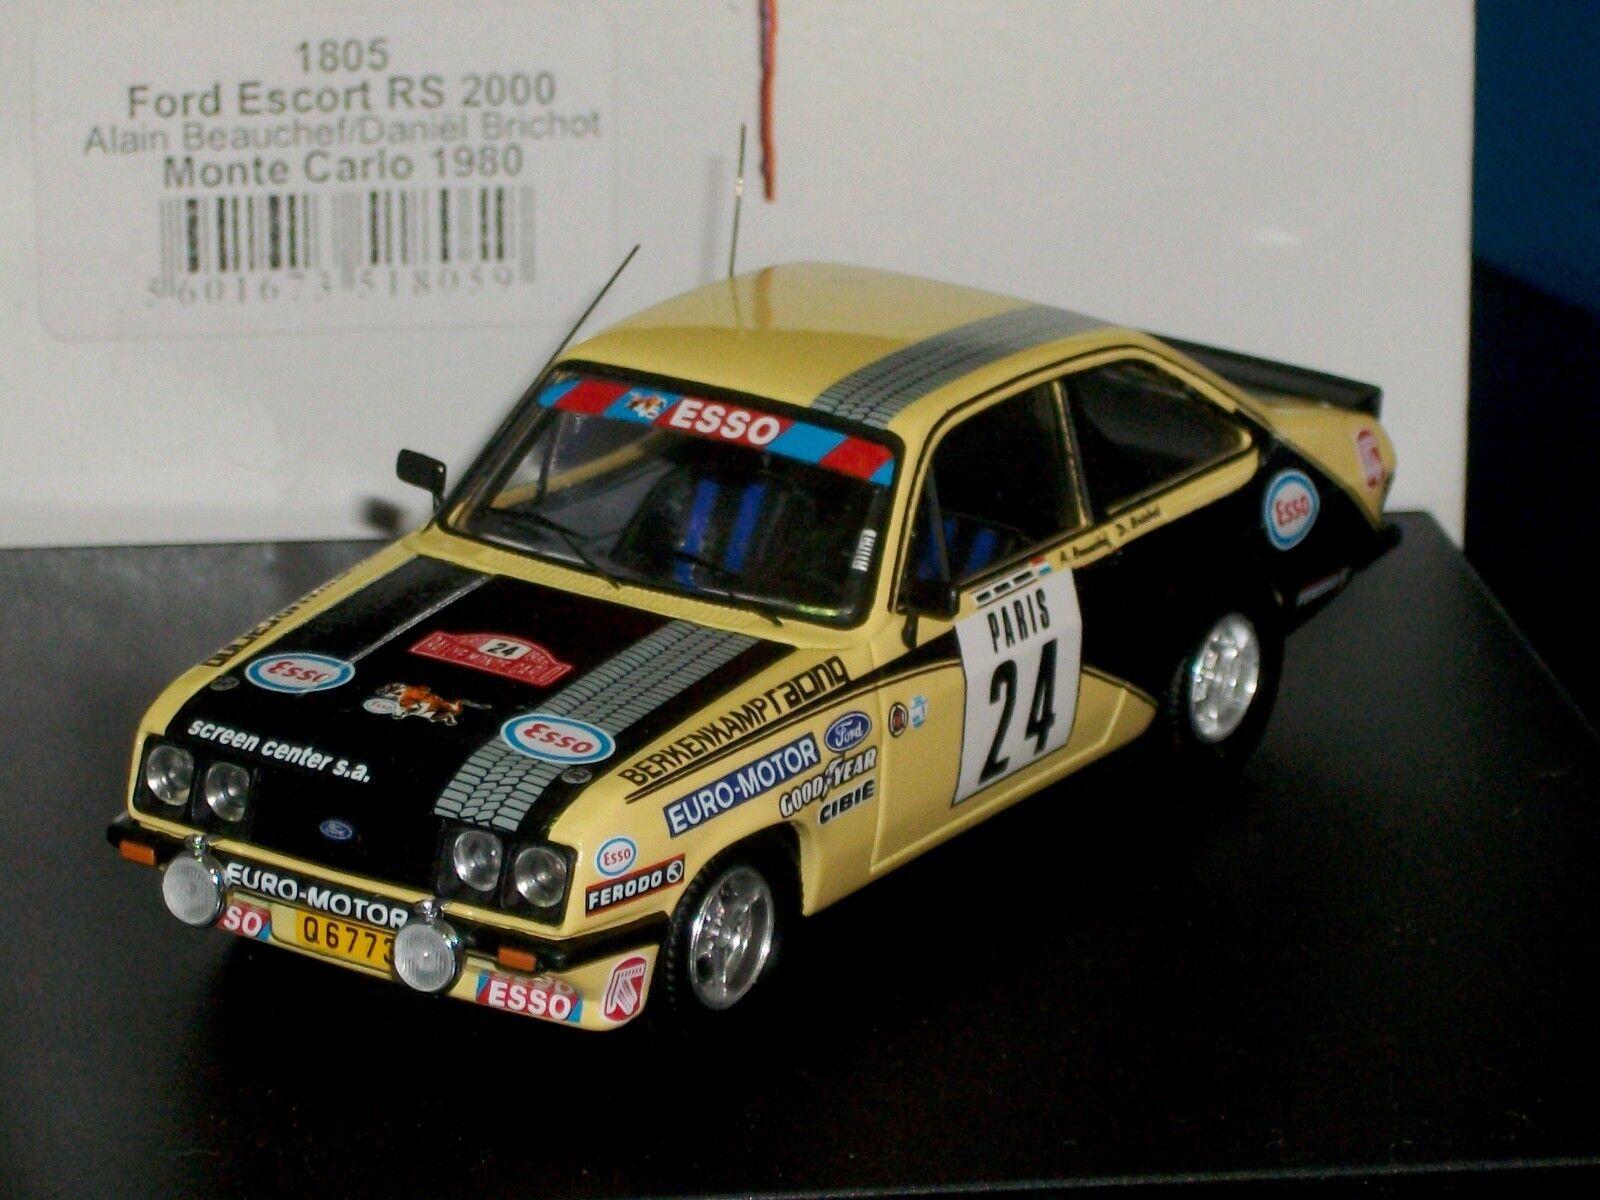 Ford Escort MK2 RS2000  24 MonteCochelo 1980 Trofeu 1805 1 43